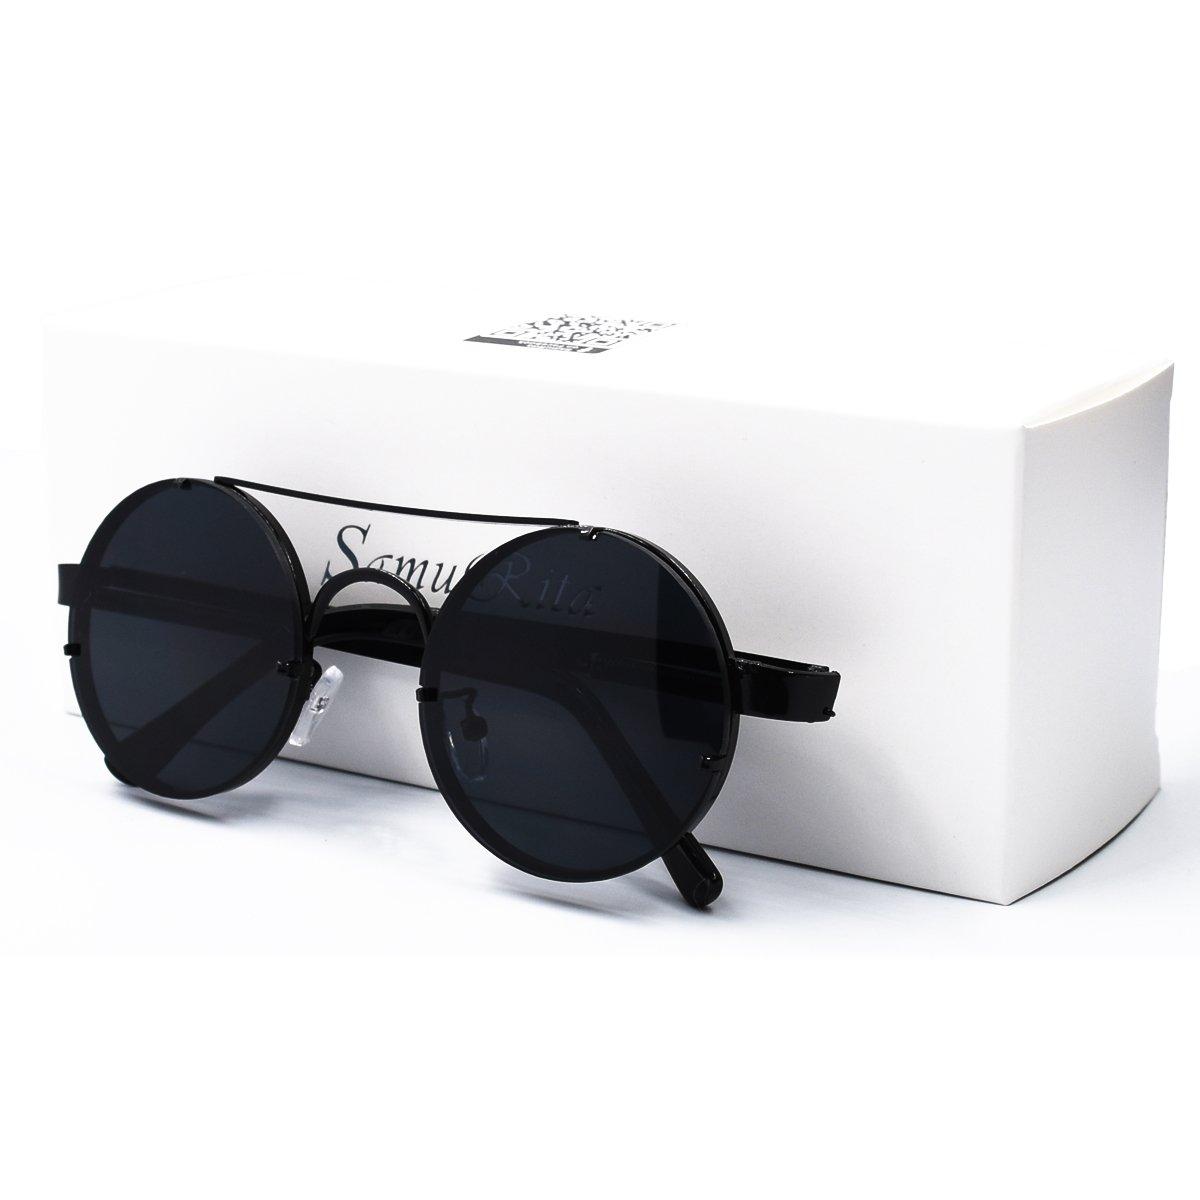 f41d8b846a6be Amazon.com  SamuRita Spring Temple Rimless Oversized Punk Round Sunglasses(Black  Lens Black Frame)  Clothing